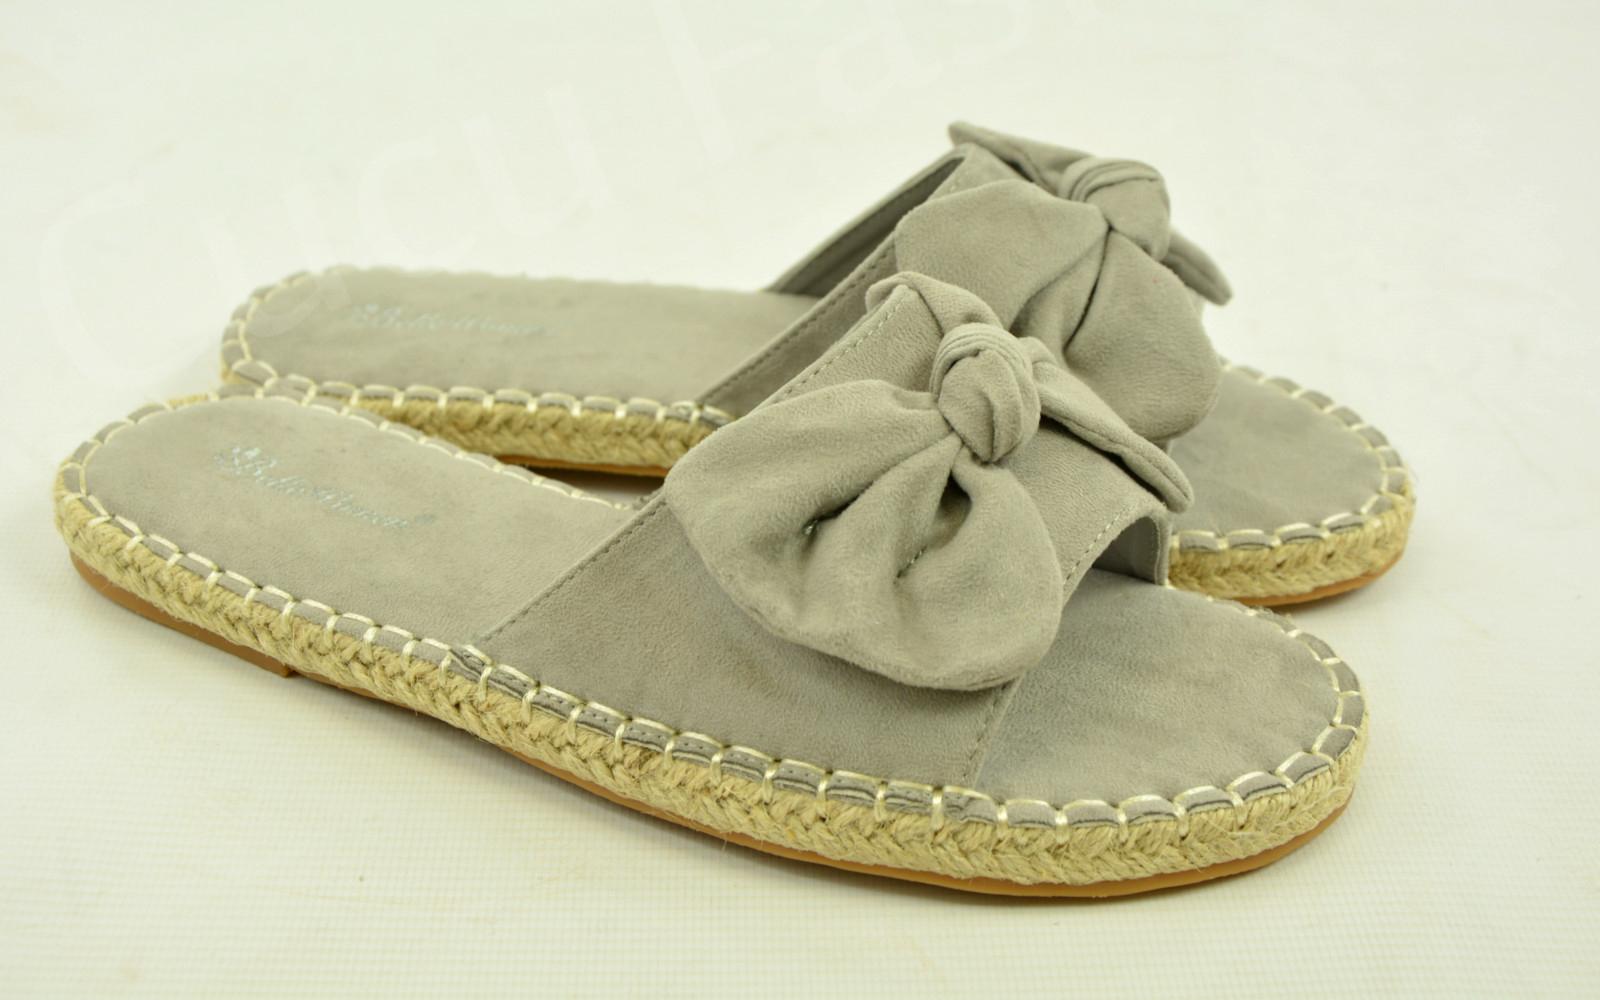 New Womens Ladies Bow Flats Girls Sandals Slip On Peep Toe Shoes Size Uk 3-8